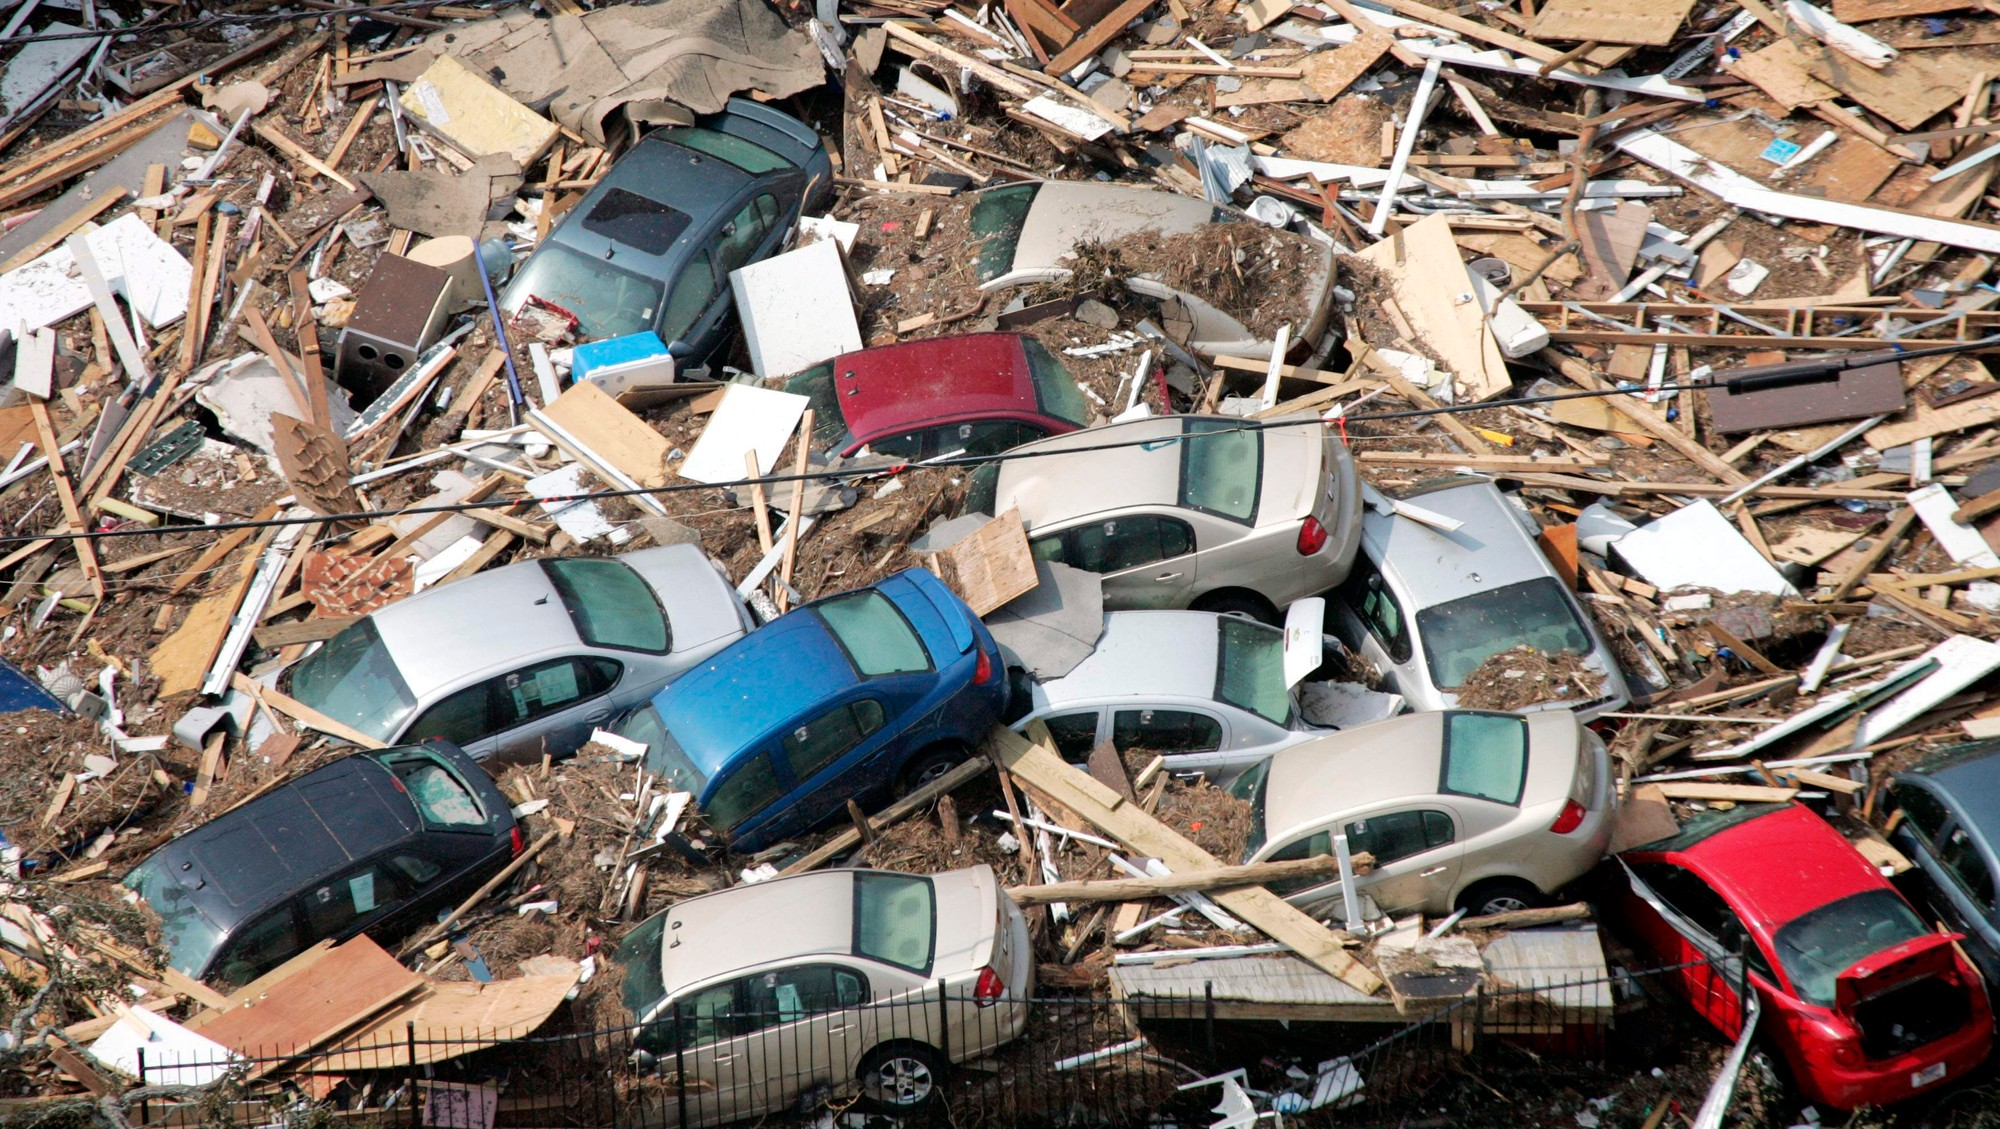 hurricane katrina damage deaths aftermath amp facts - 990×648